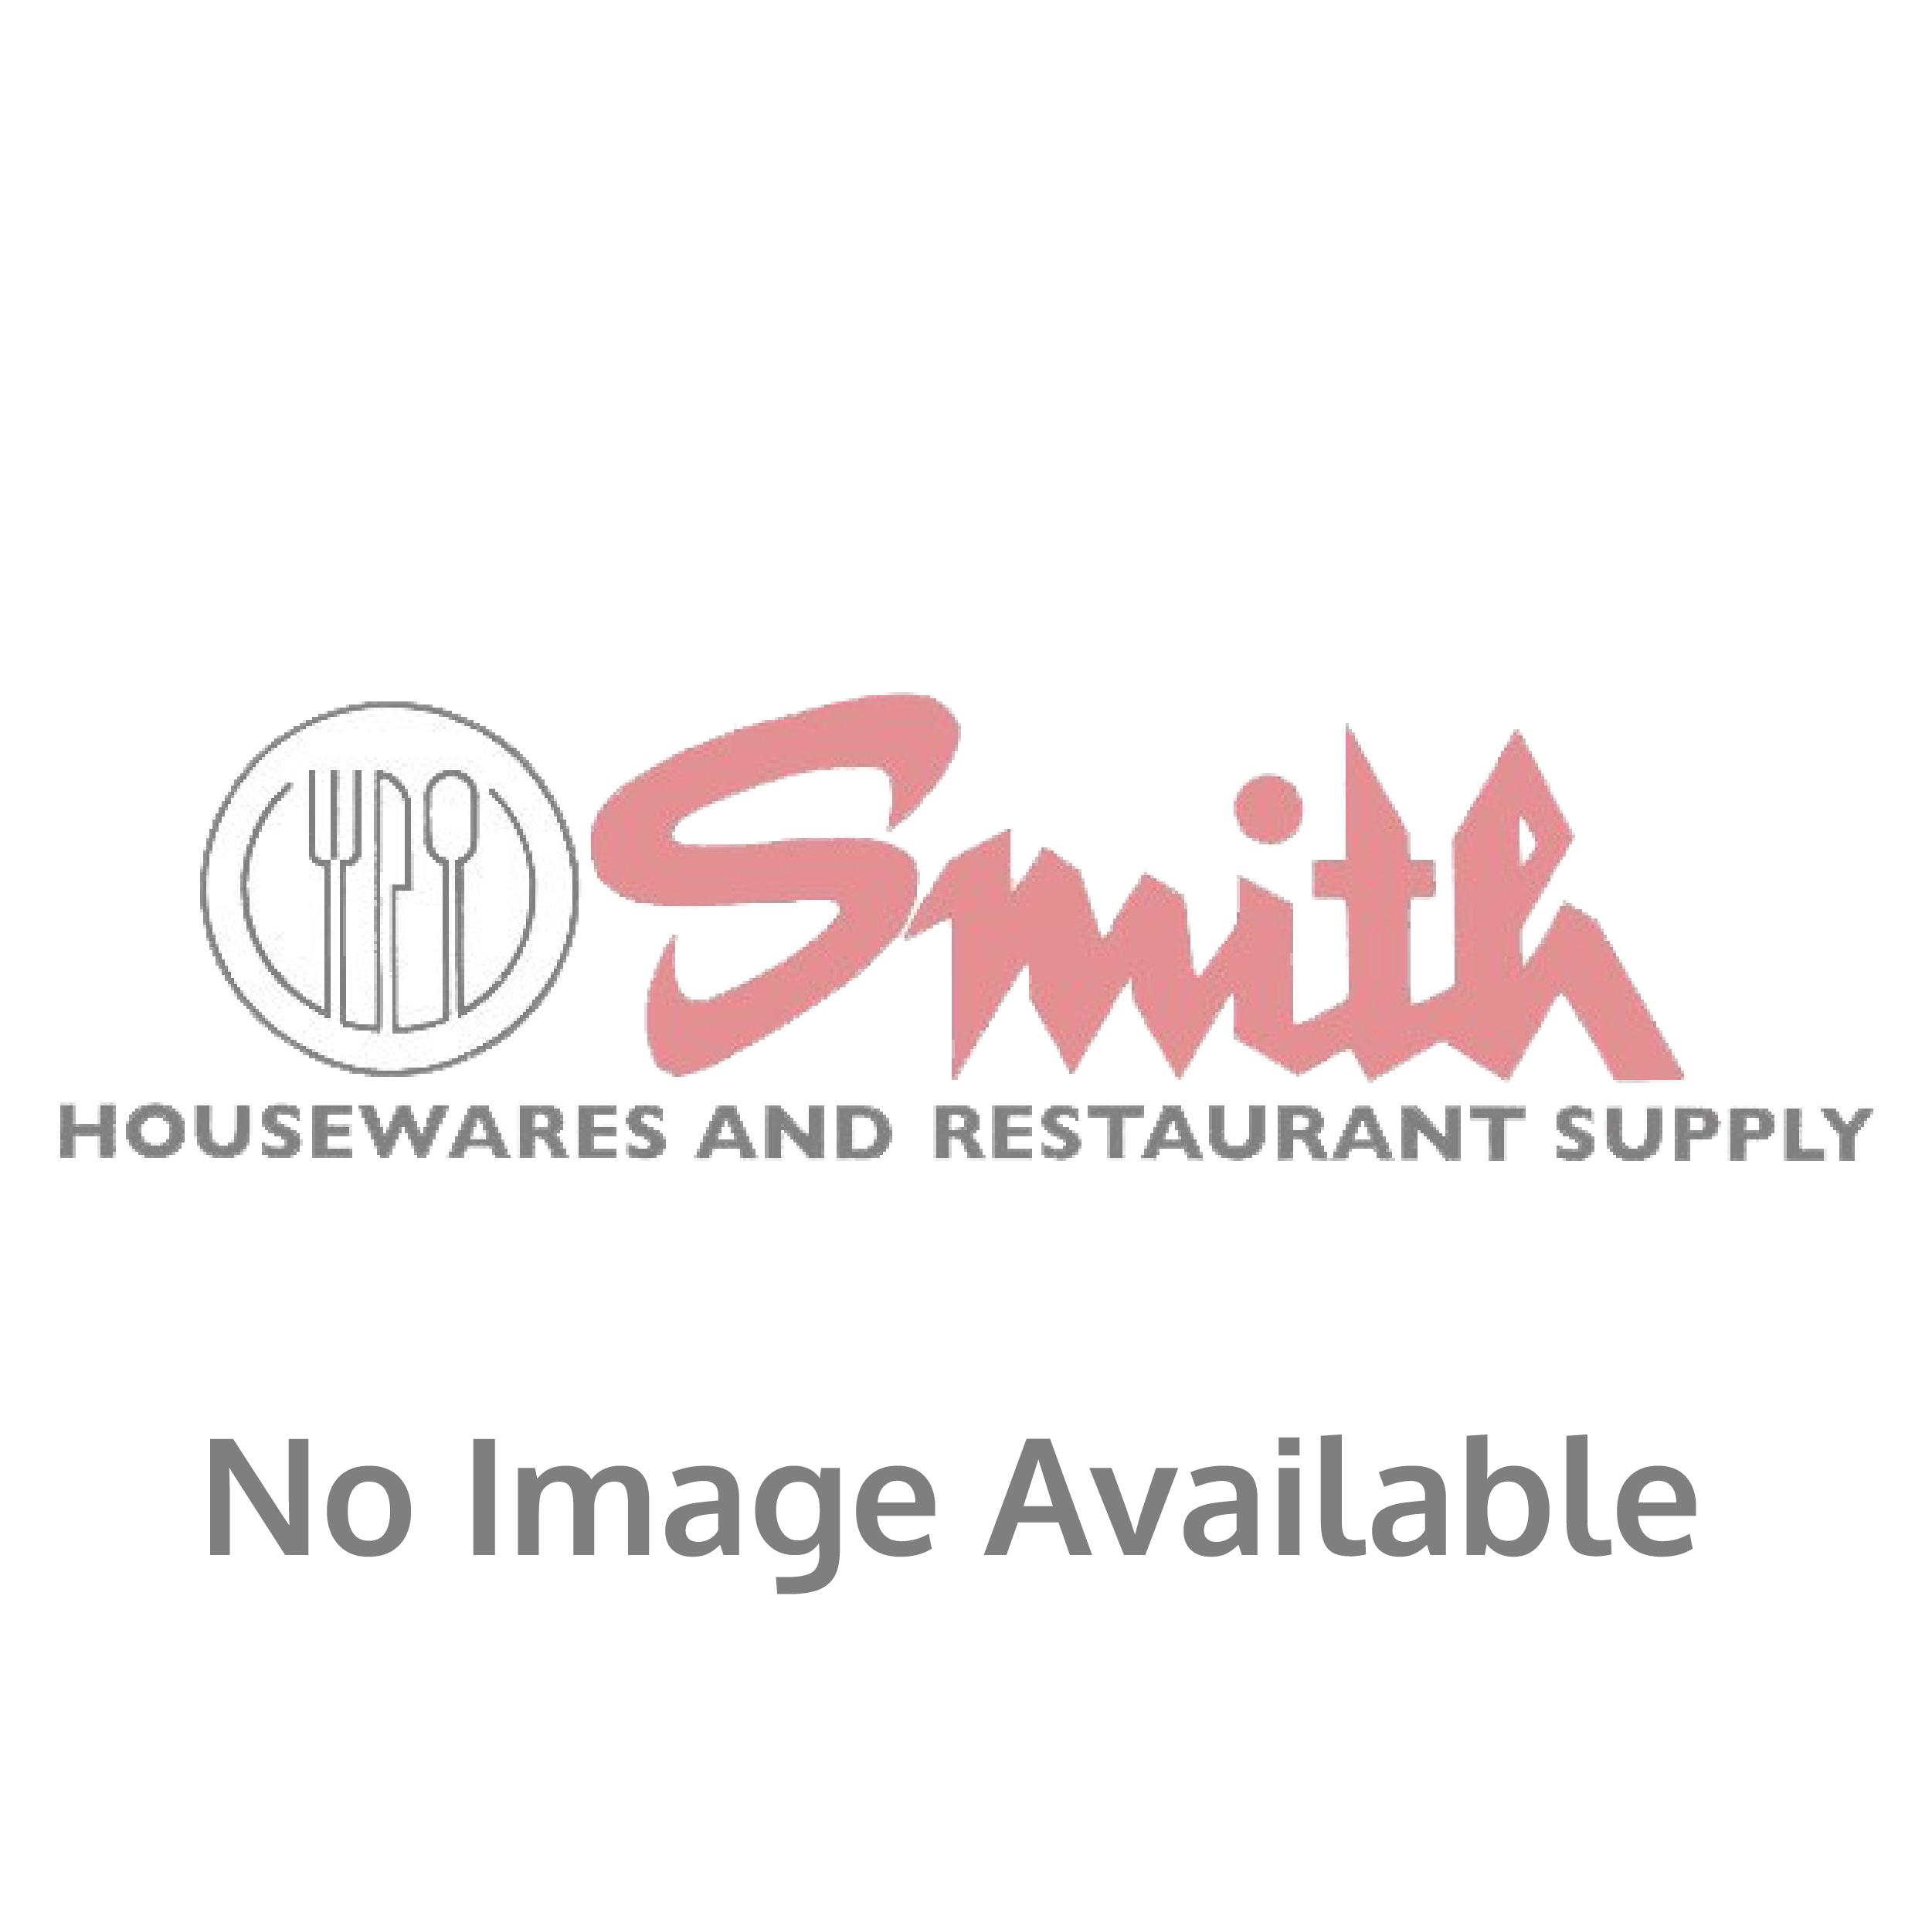 8# Printed ice bag, 8x3, 1000/cs w/ Twist Ties